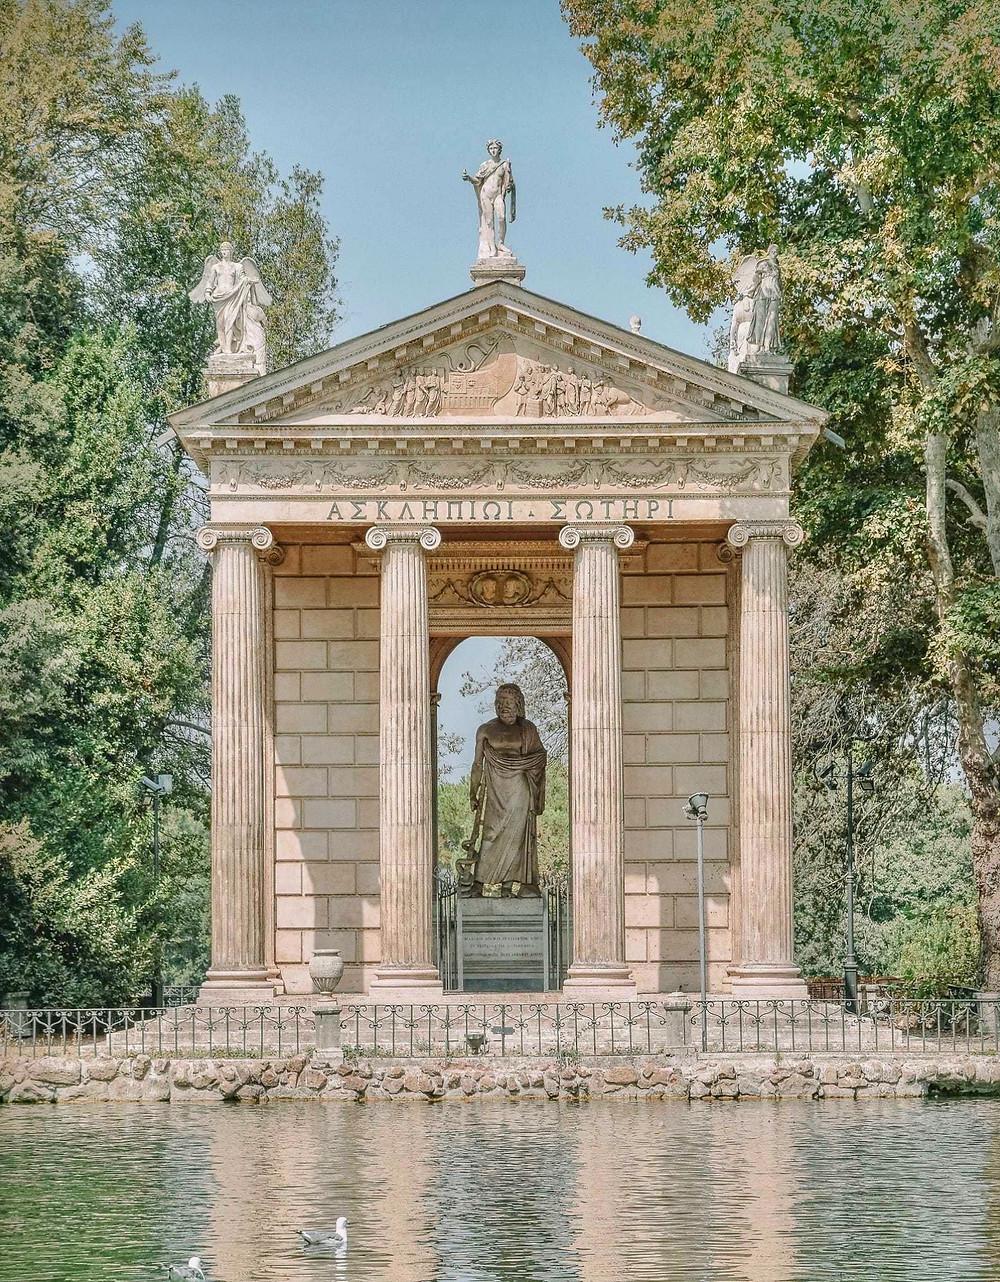 Temple of Diana in the Villa Borghese Gardens